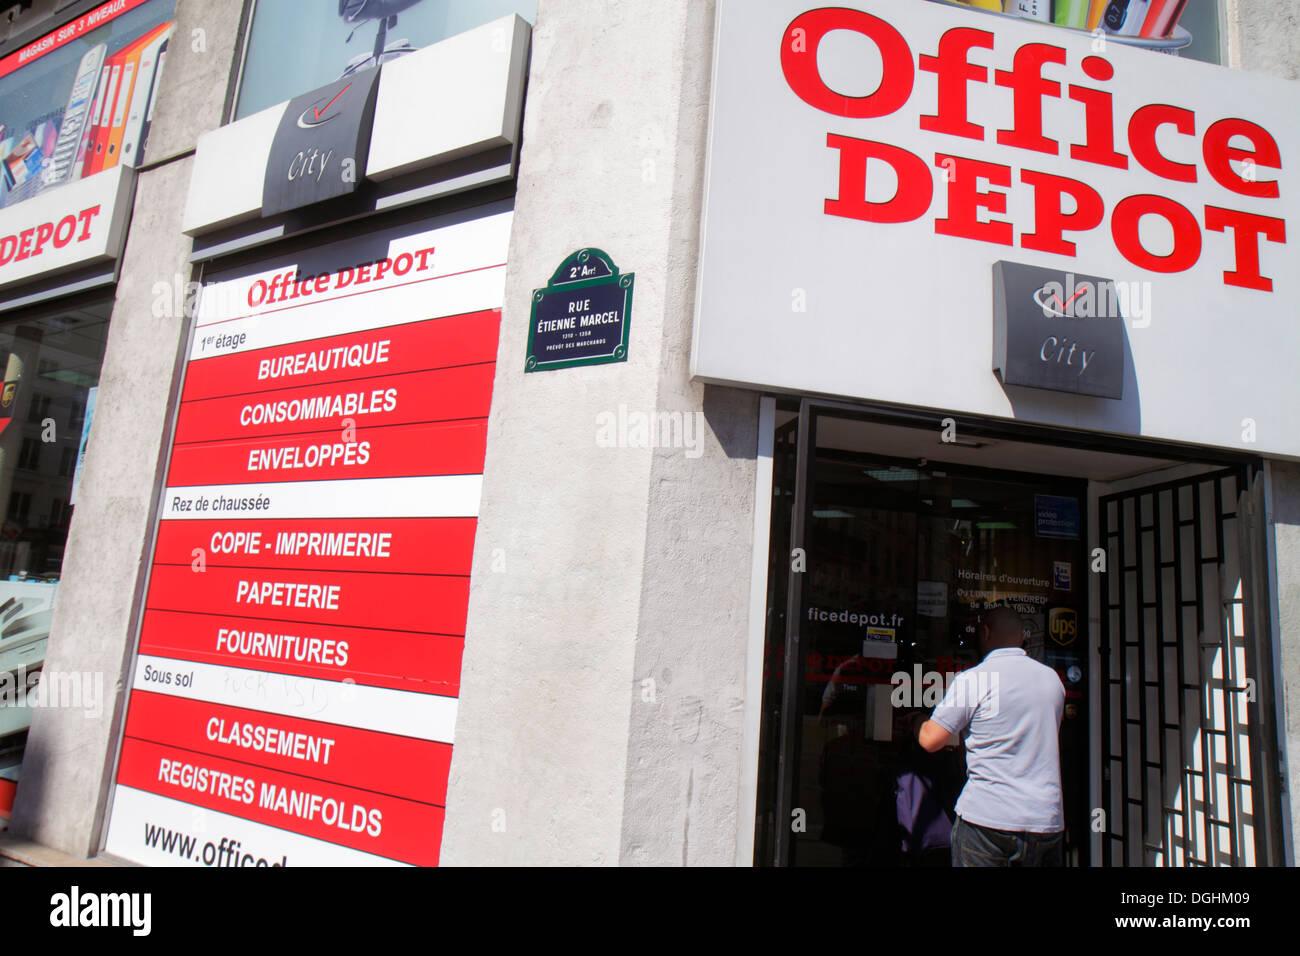 Paris France Europe French 2nd arrondissement Boulevard de Sébastopol Office Depot front entrance business supply store street s - Stock Image